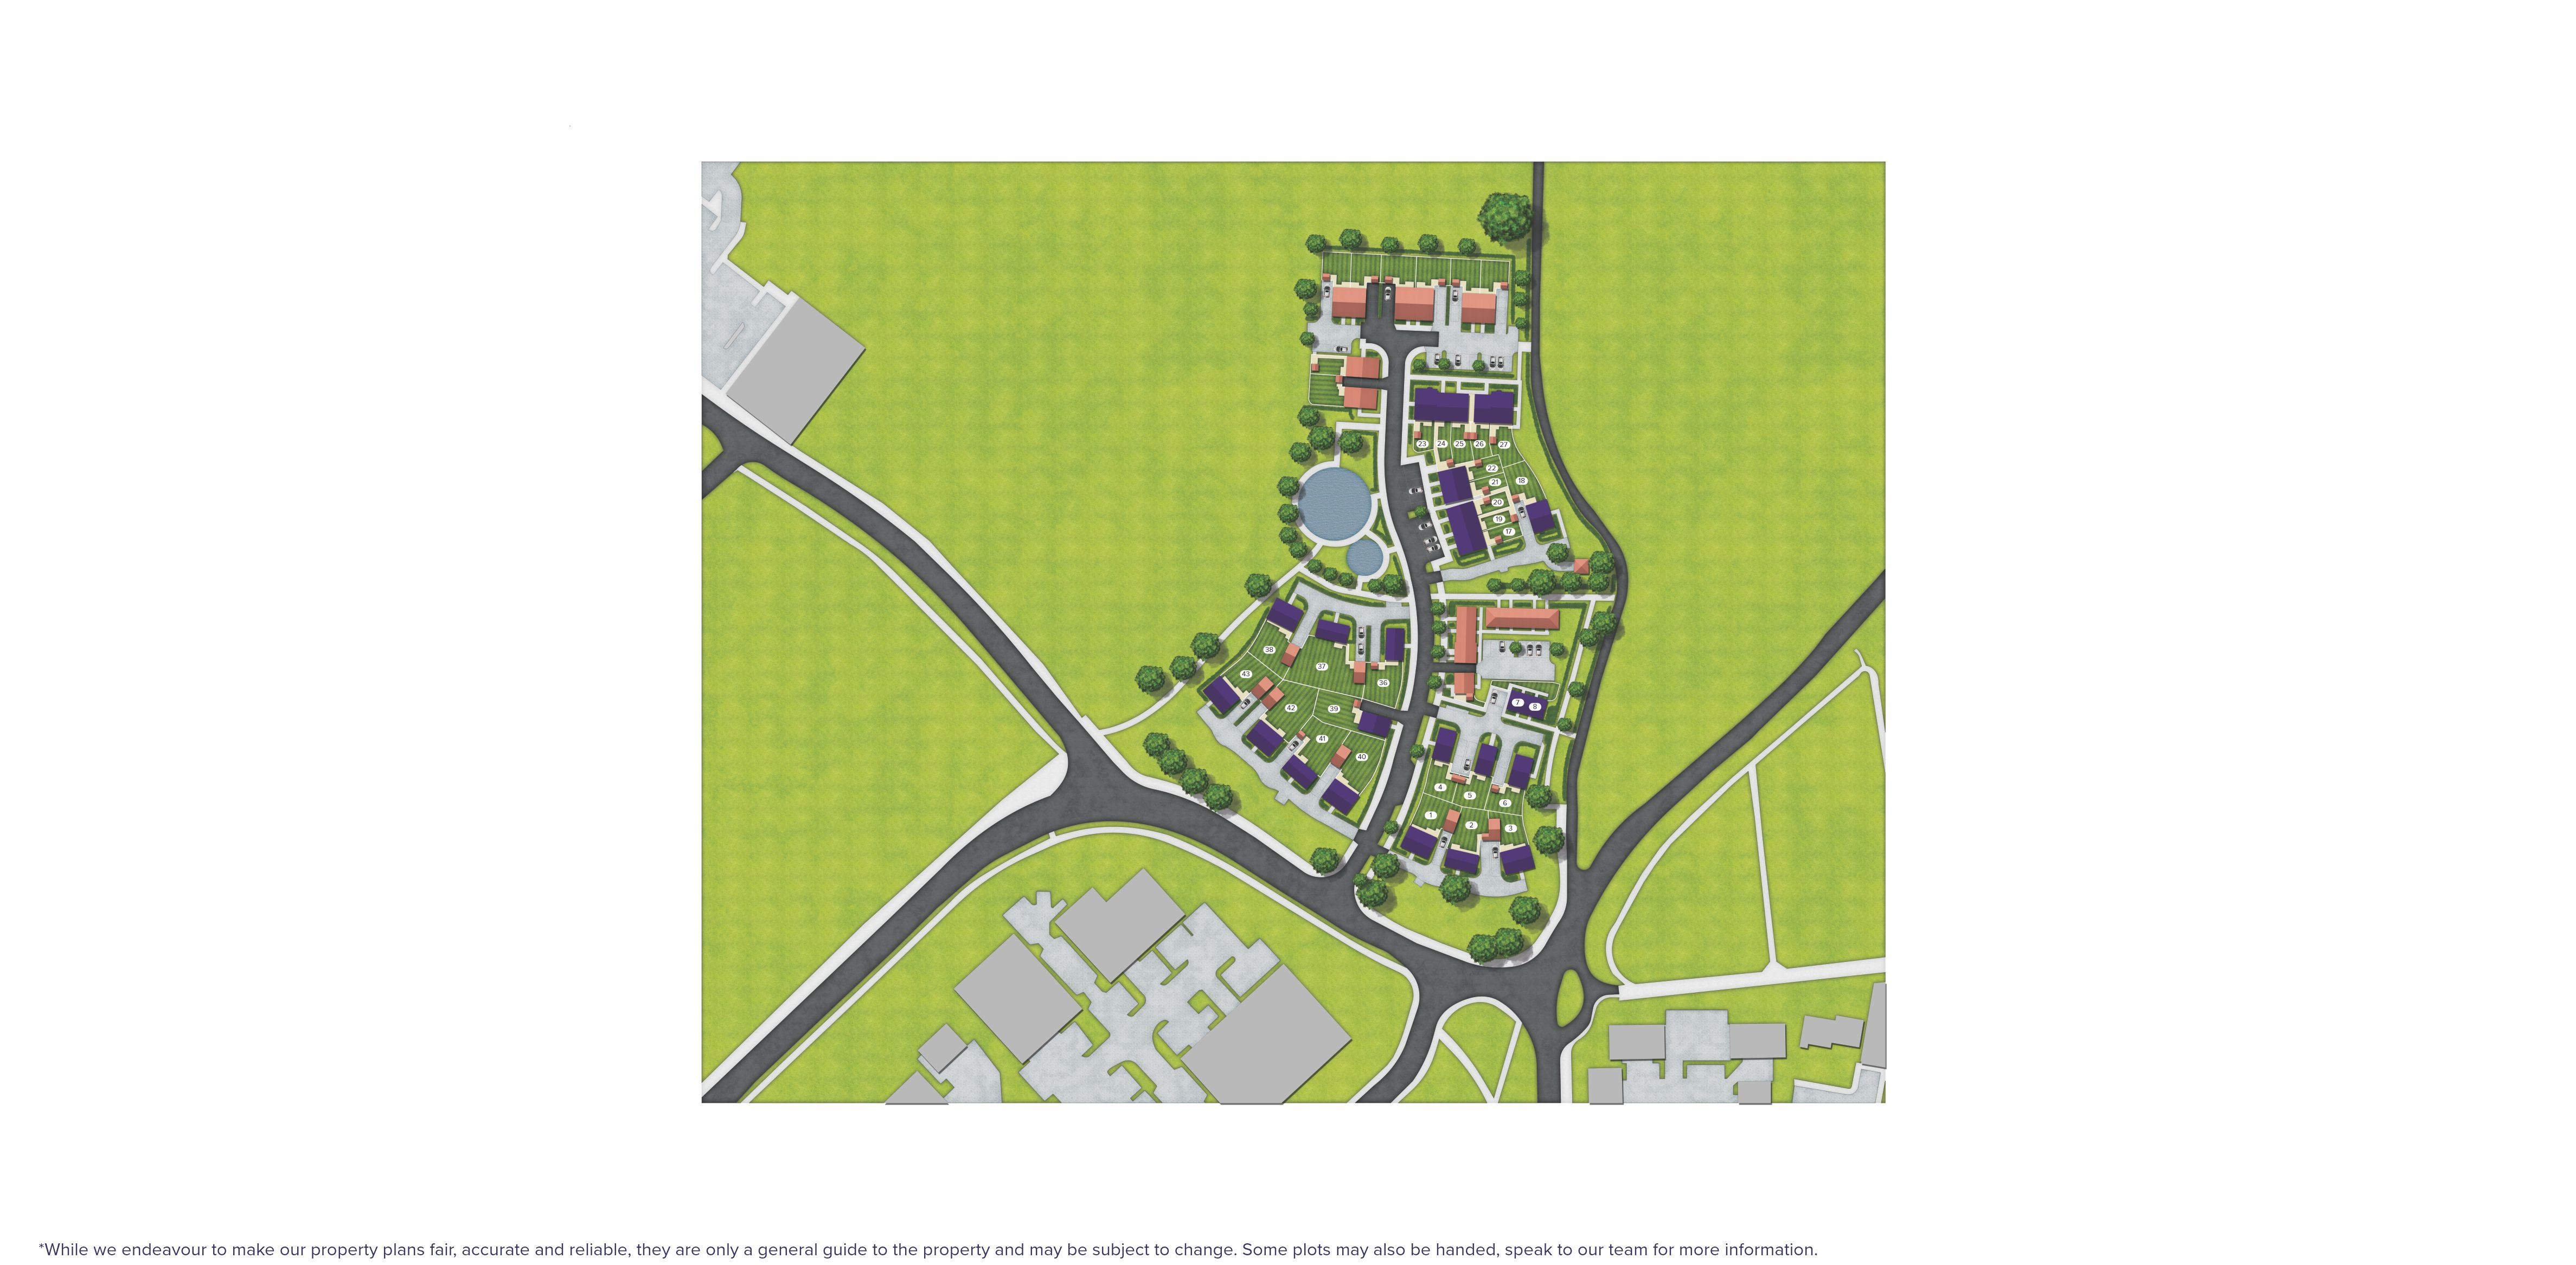 Monkton Place, Farnham - site map